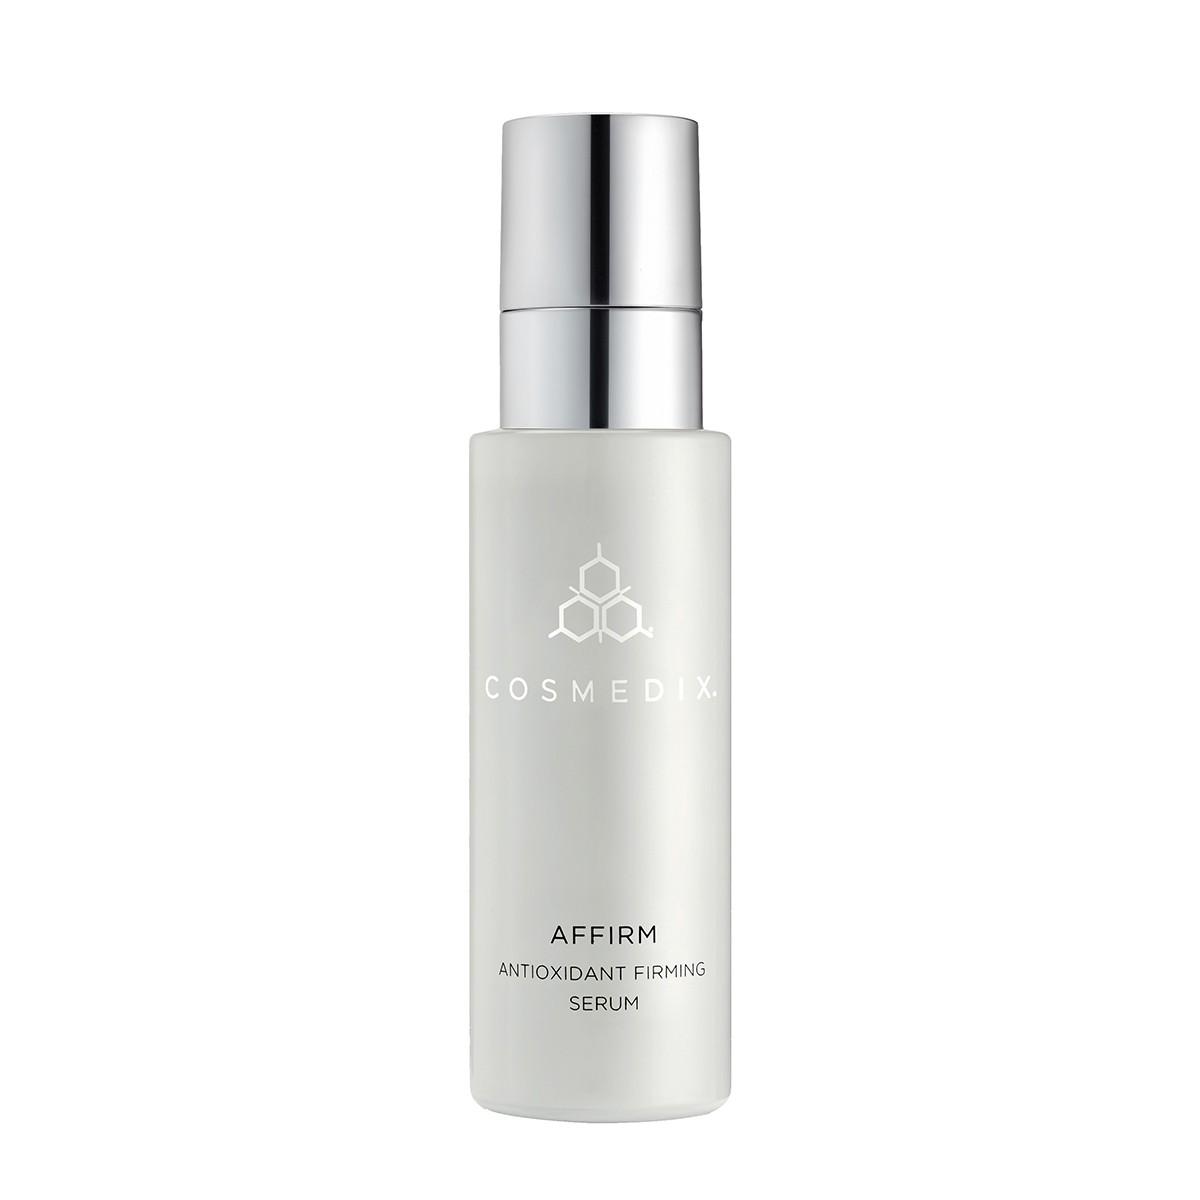 Copy of Copy of AFFIRM  Antioxidant Firming Serum